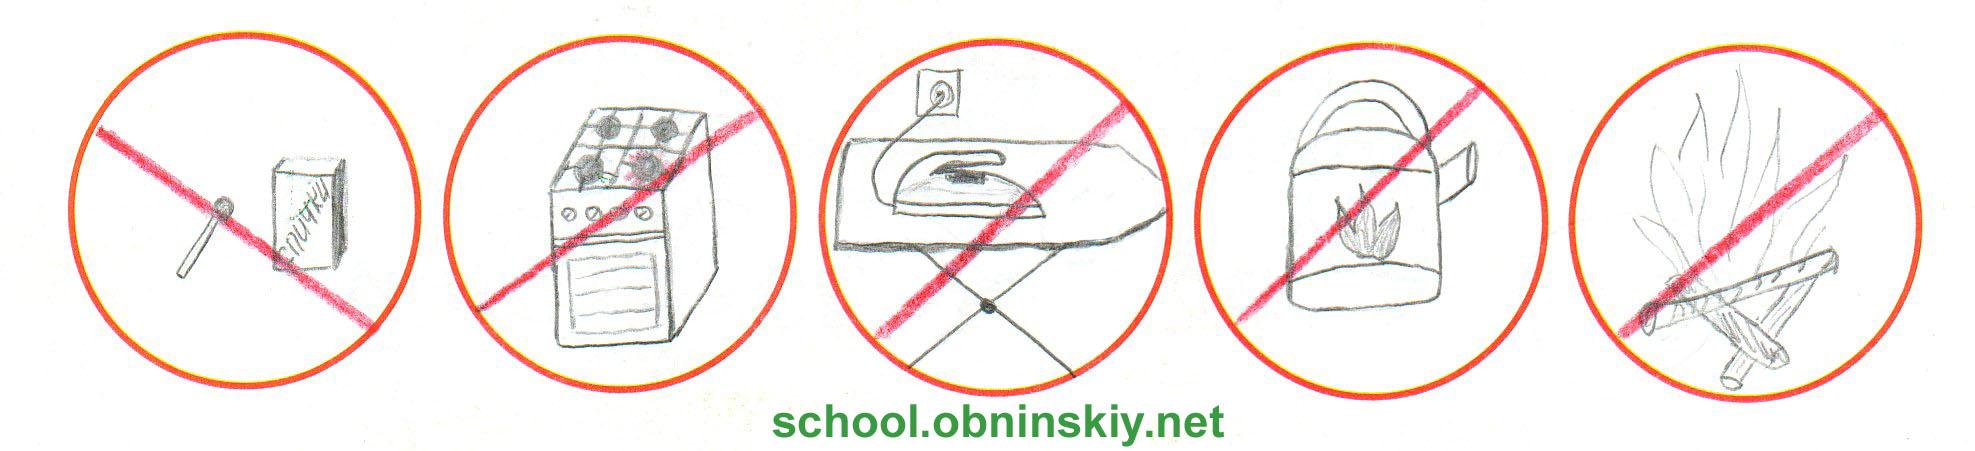 Описание: http://school.obninskiy.net/data/uploads/okr_mir/okrmir_kl2_ch2_15.jpg